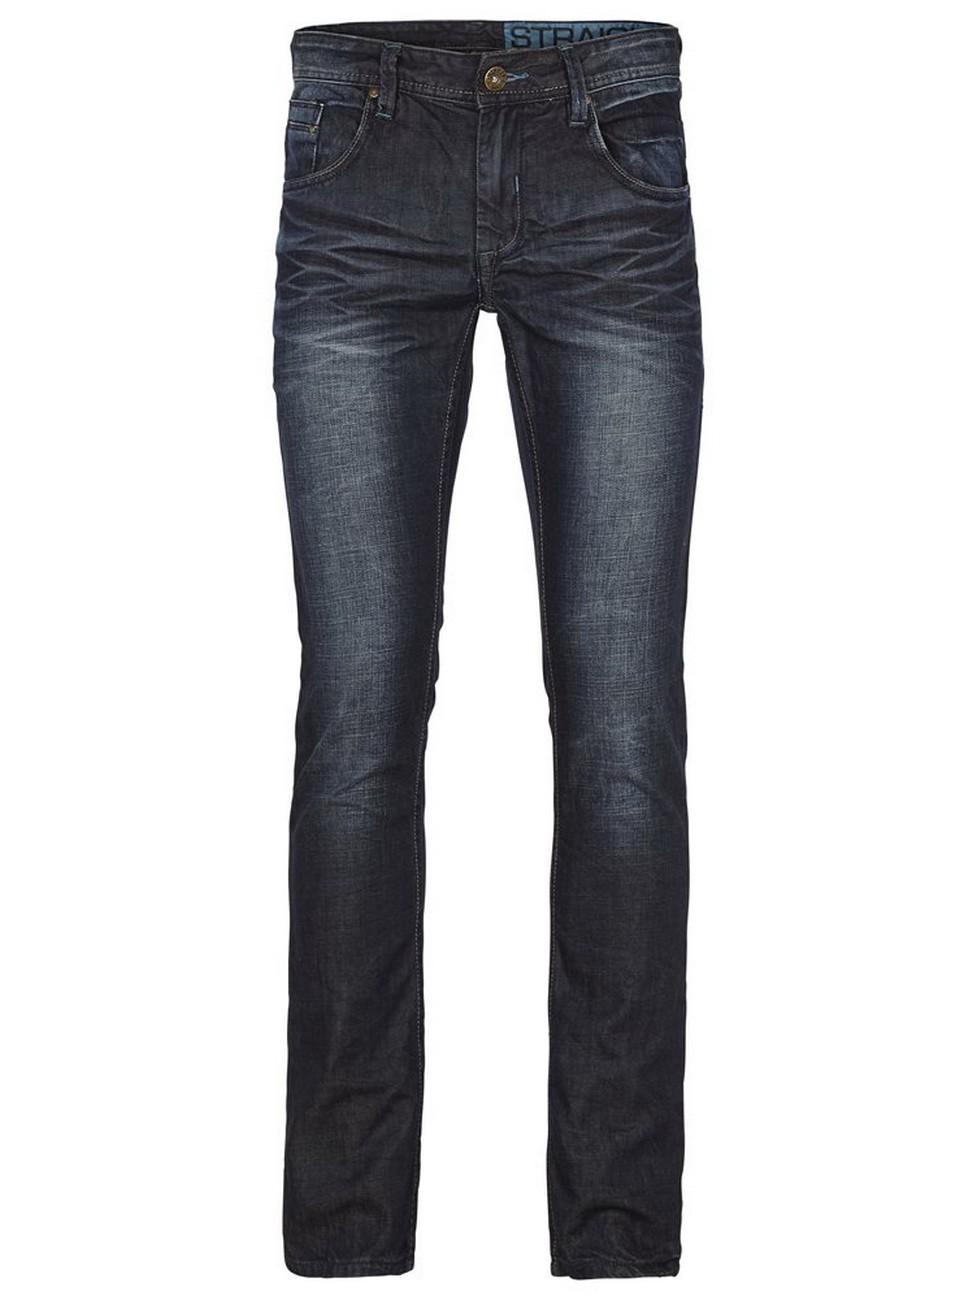 shine original herren jeans greenwich regular fit blau michael ebay. Black Bedroom Furniture Sets. Home Design Ideas